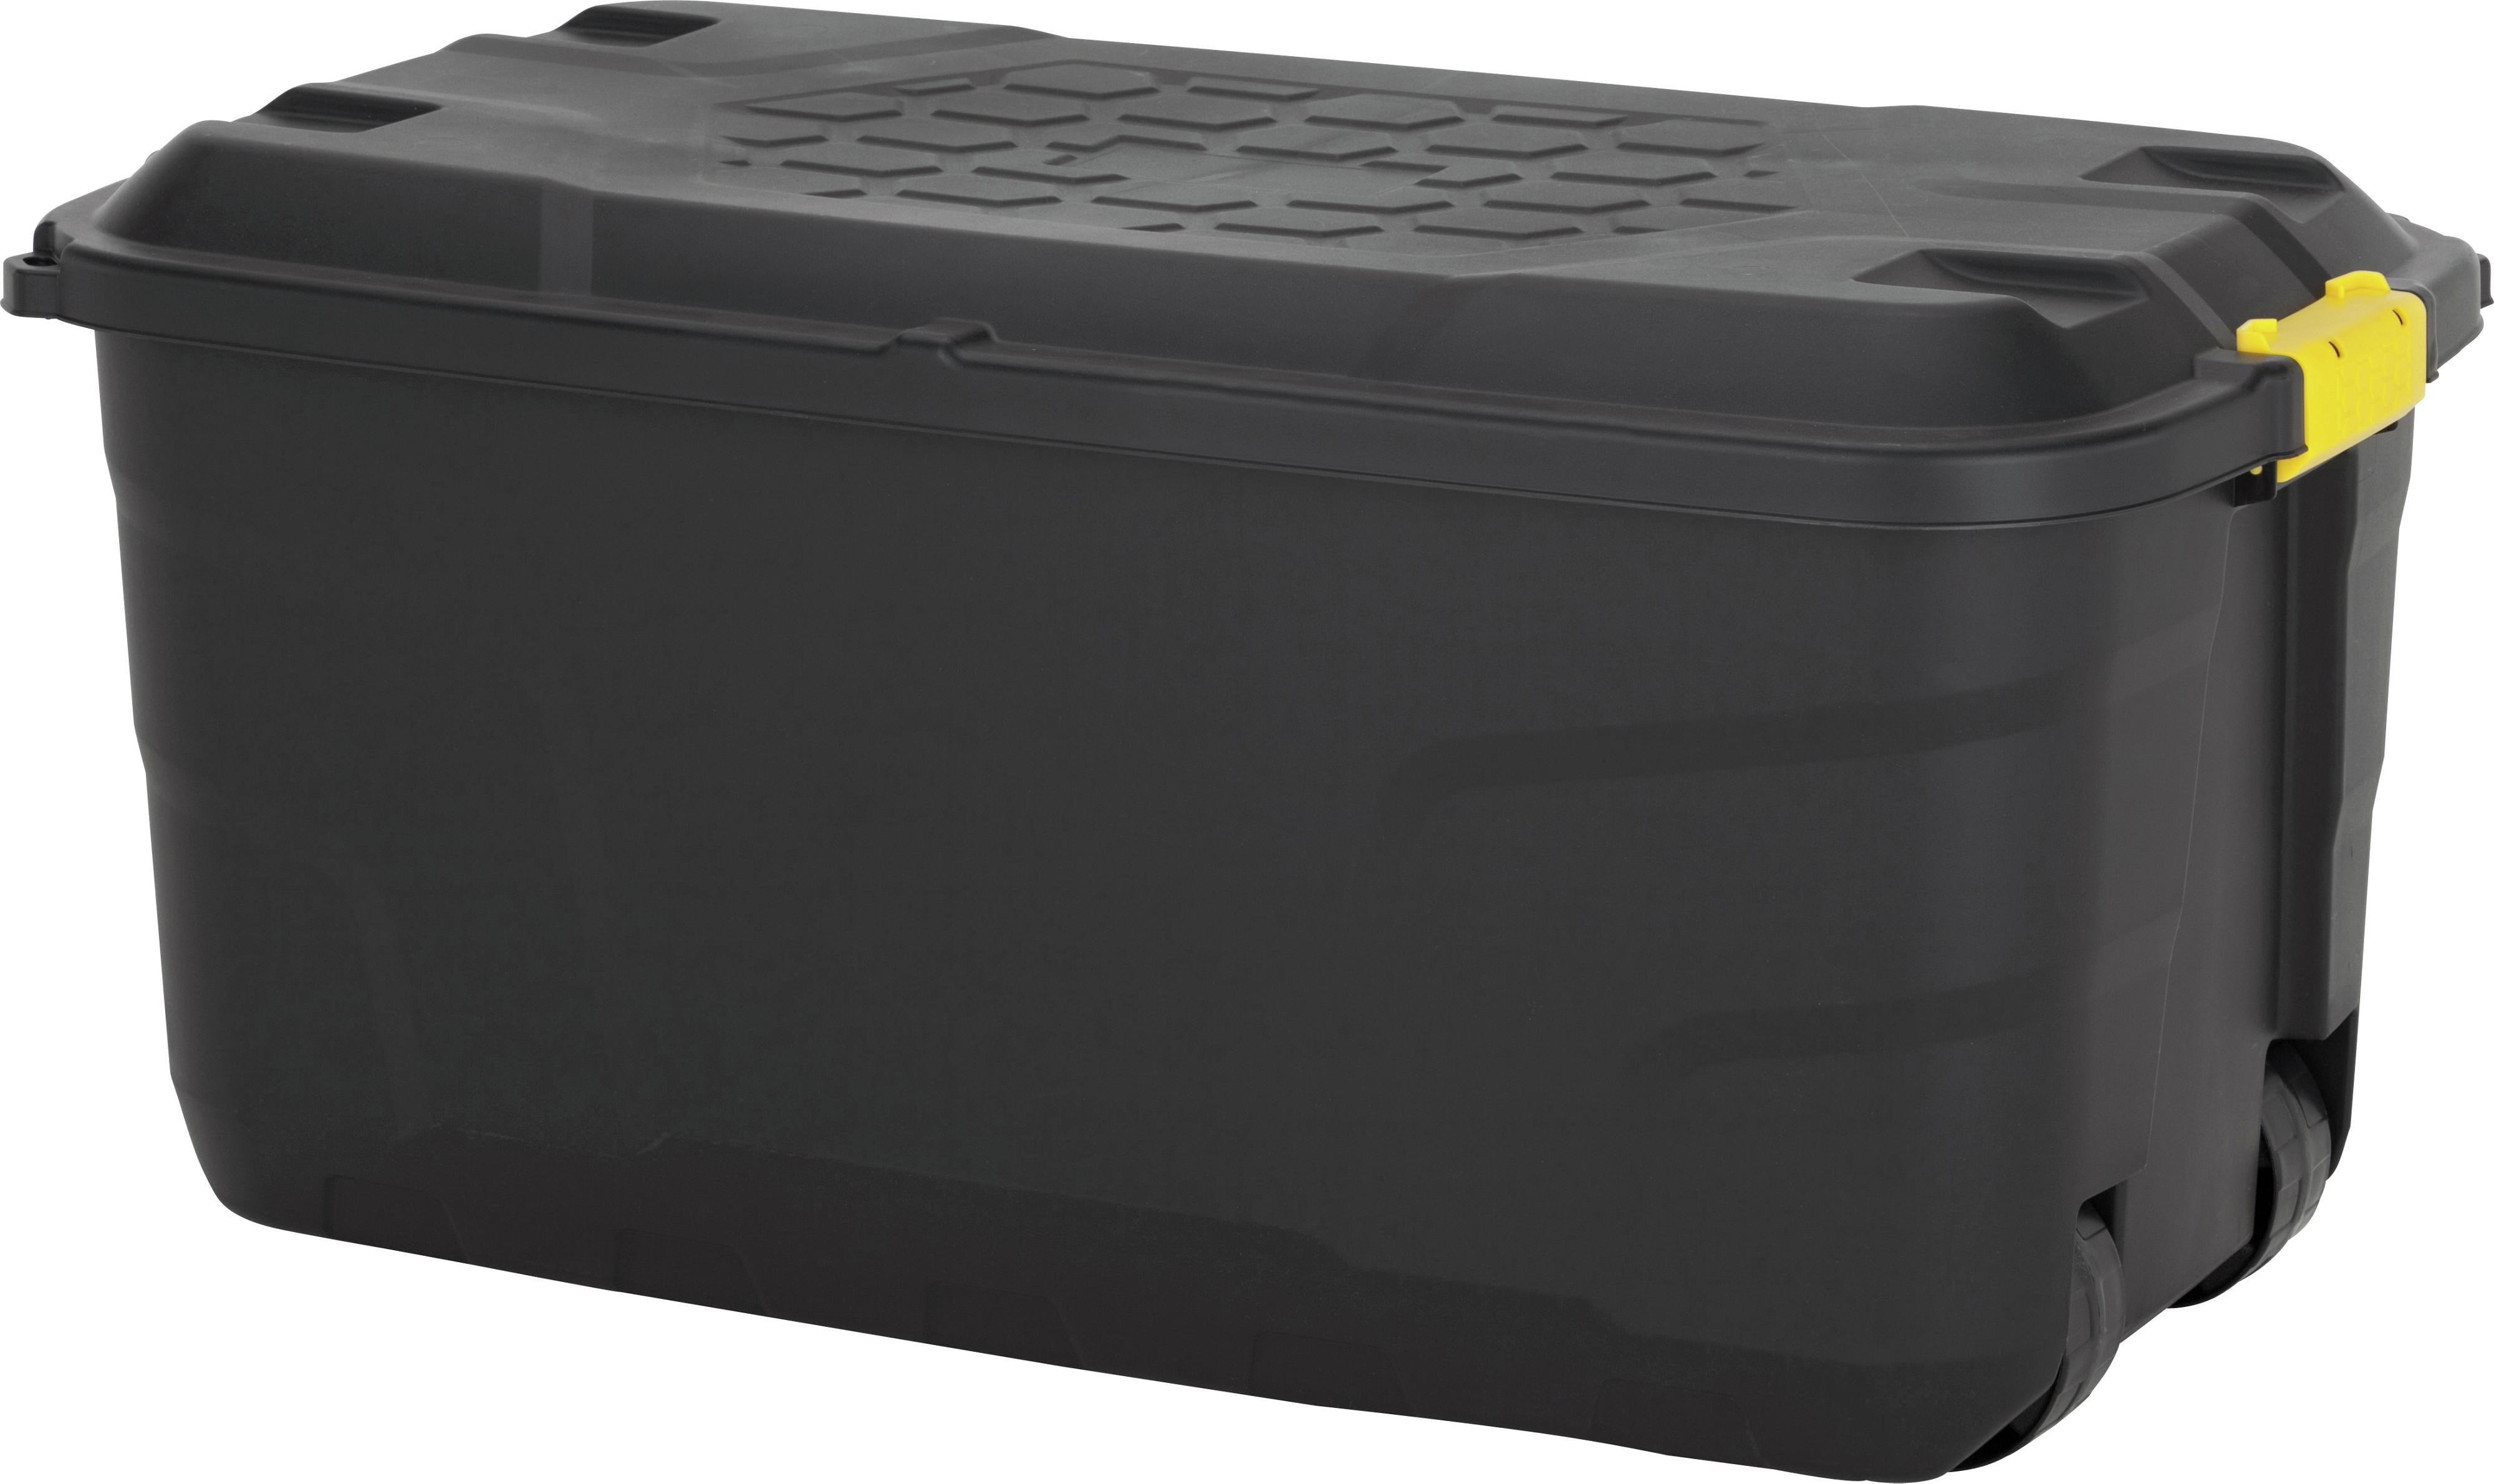 Plastic Storage Boxes U0026 Units | Argos